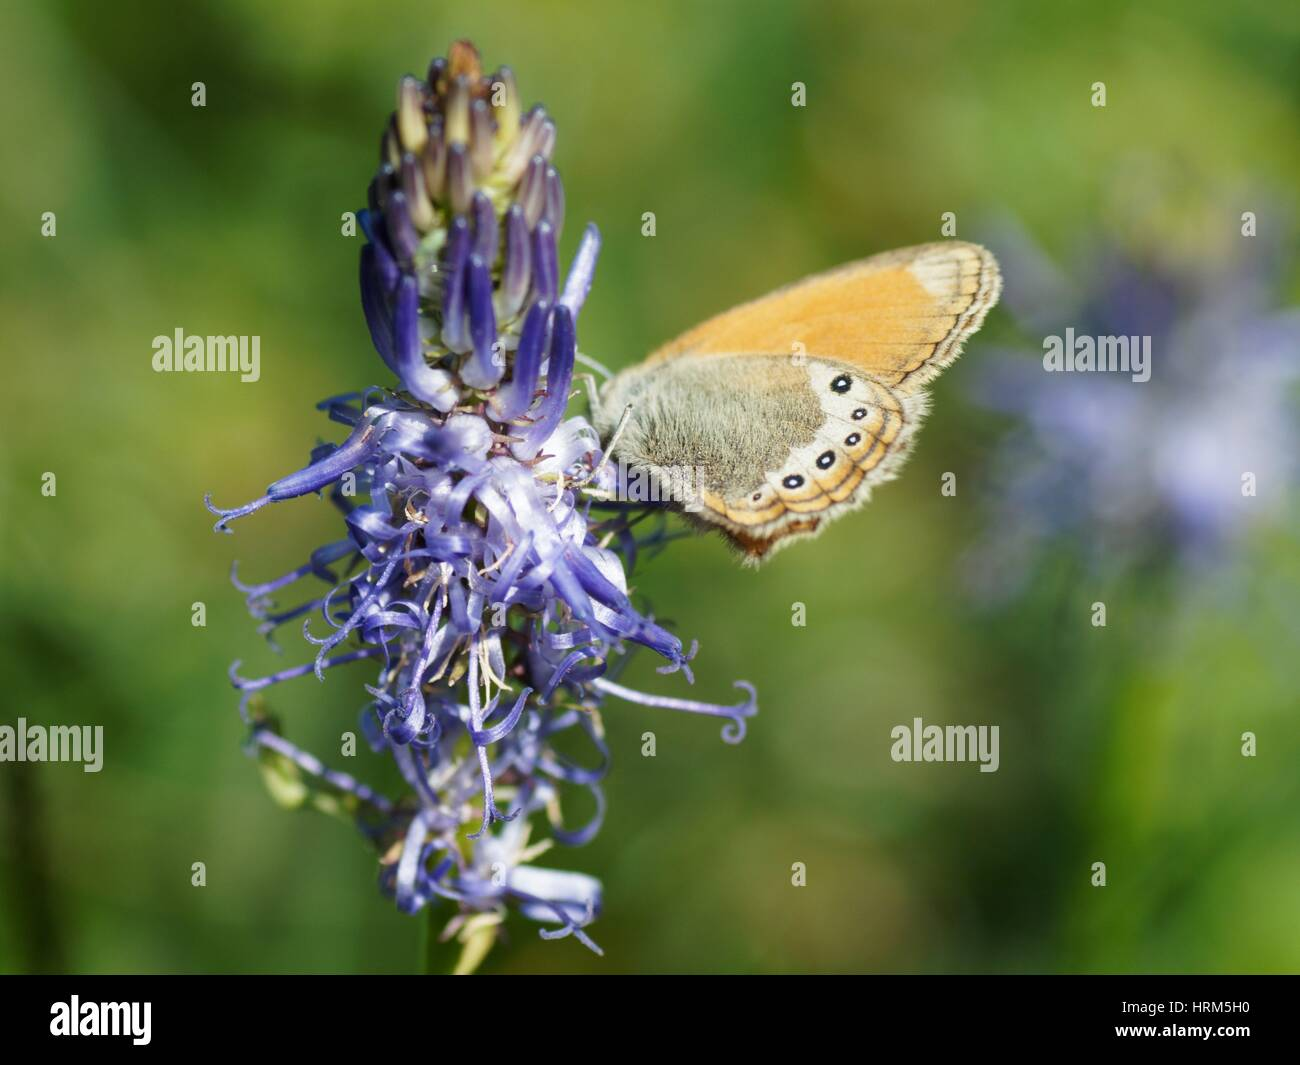 lpine Heath (Coenonympha gardetta) on a flower, Alps, France Stock Photo